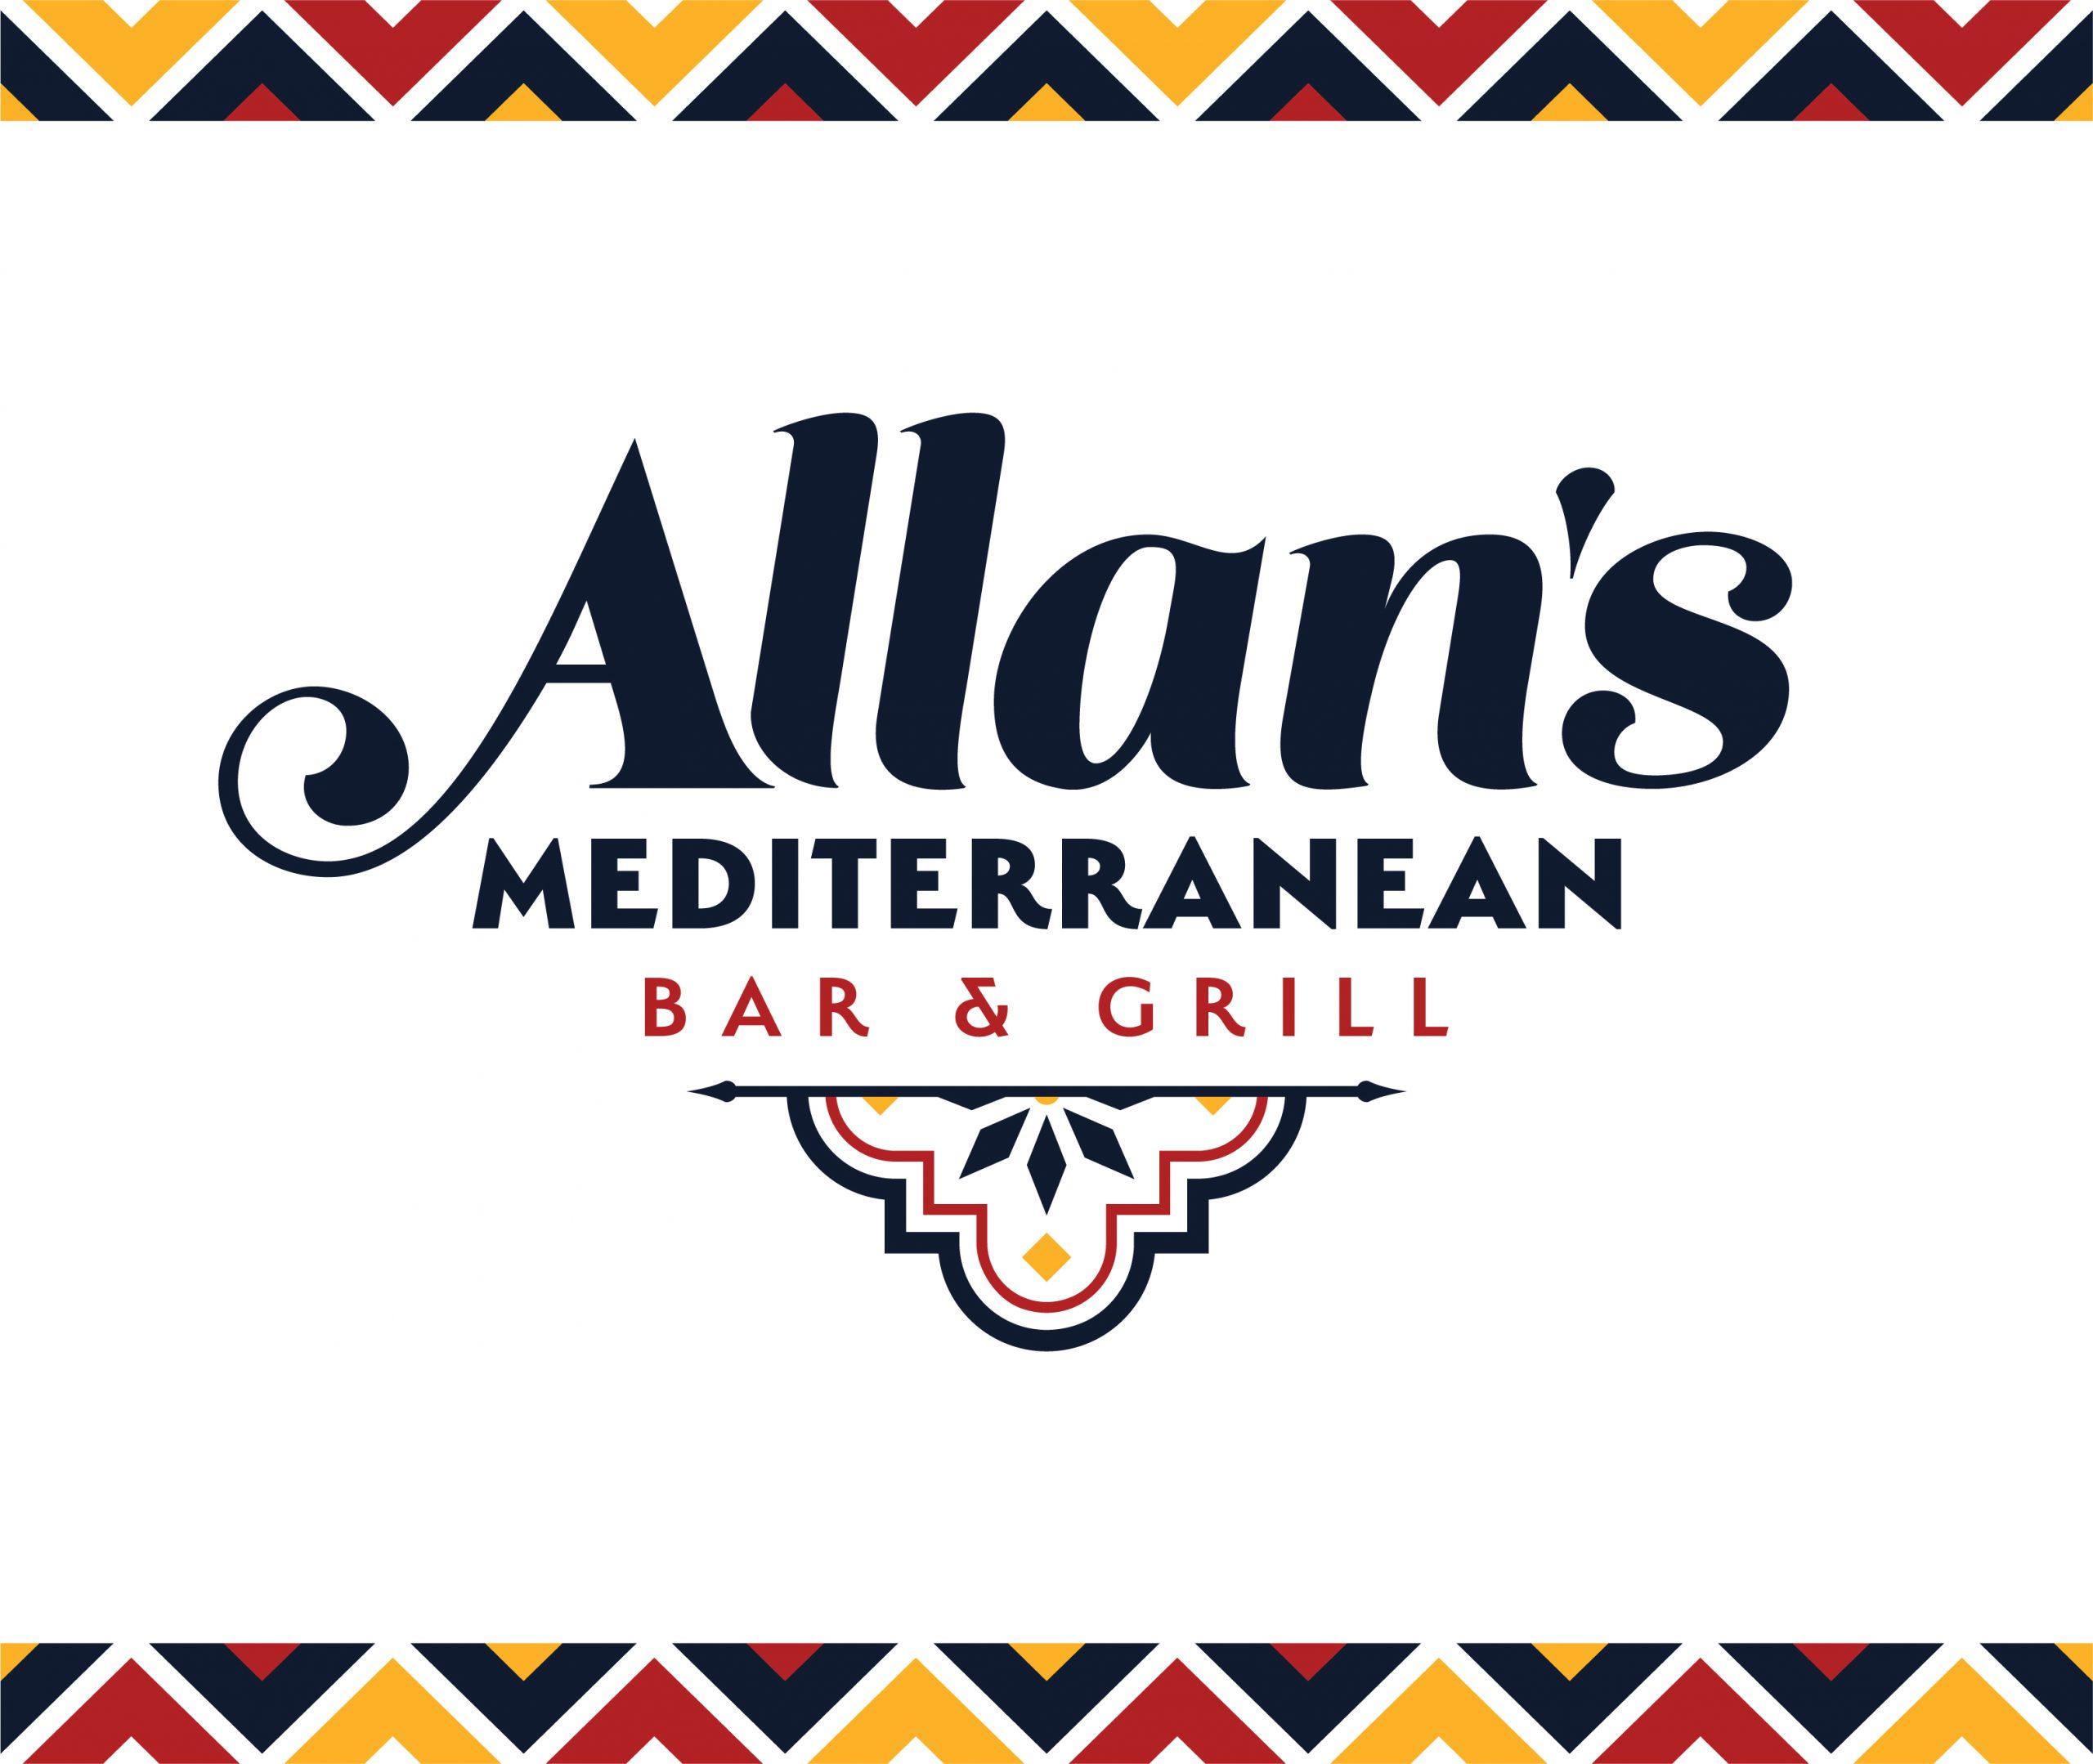 Allan's Mediterranean Bar & Grill